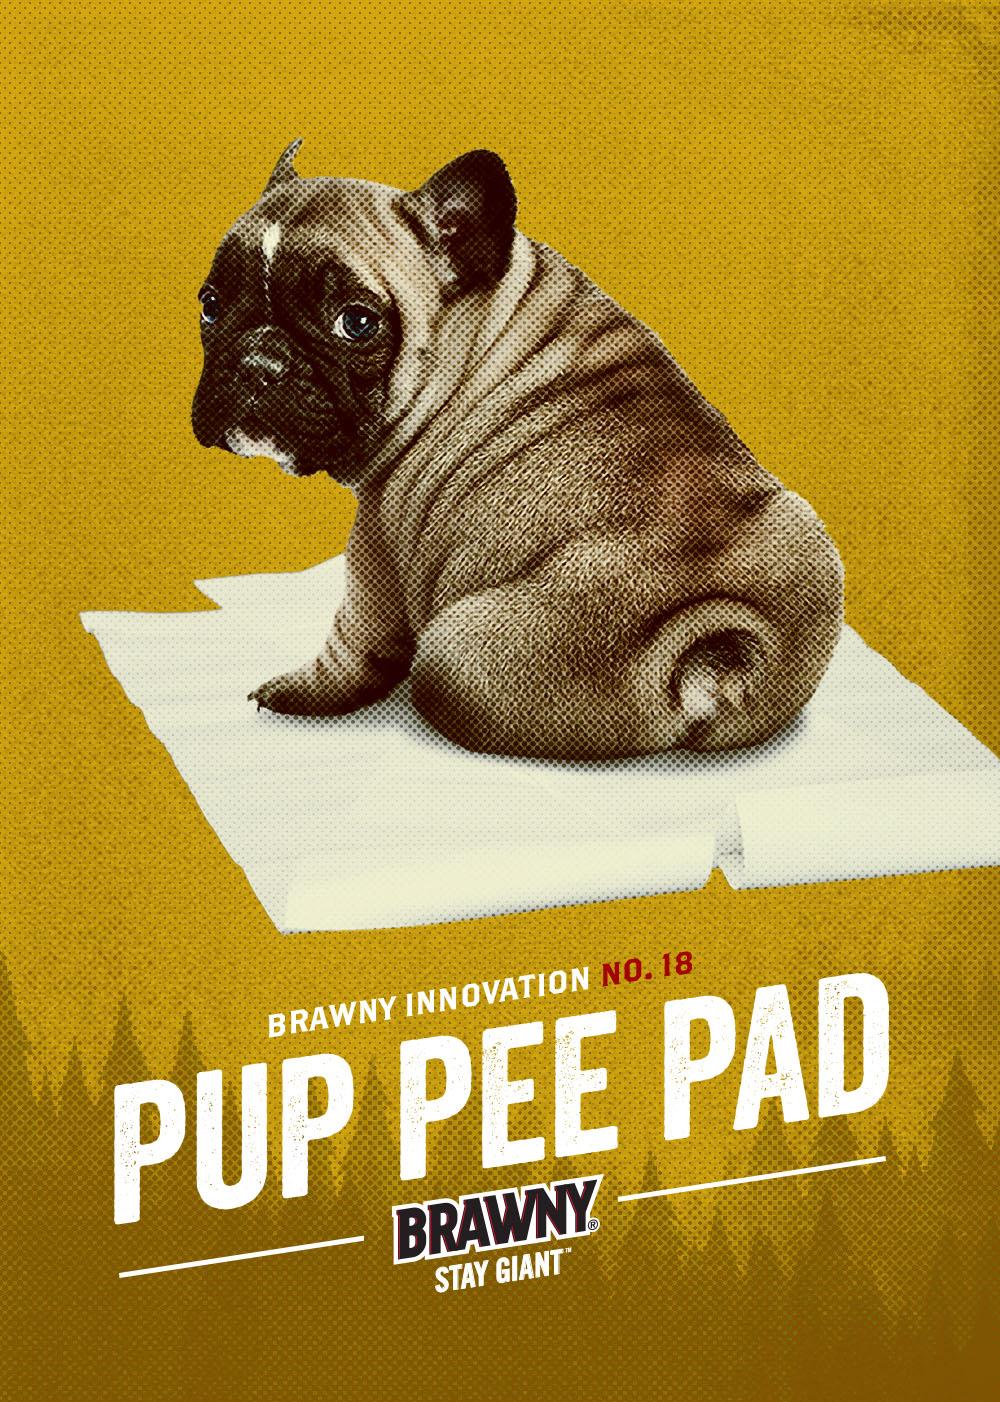 Brawny_Brawny_Innovation_Pup_Pee_Pad